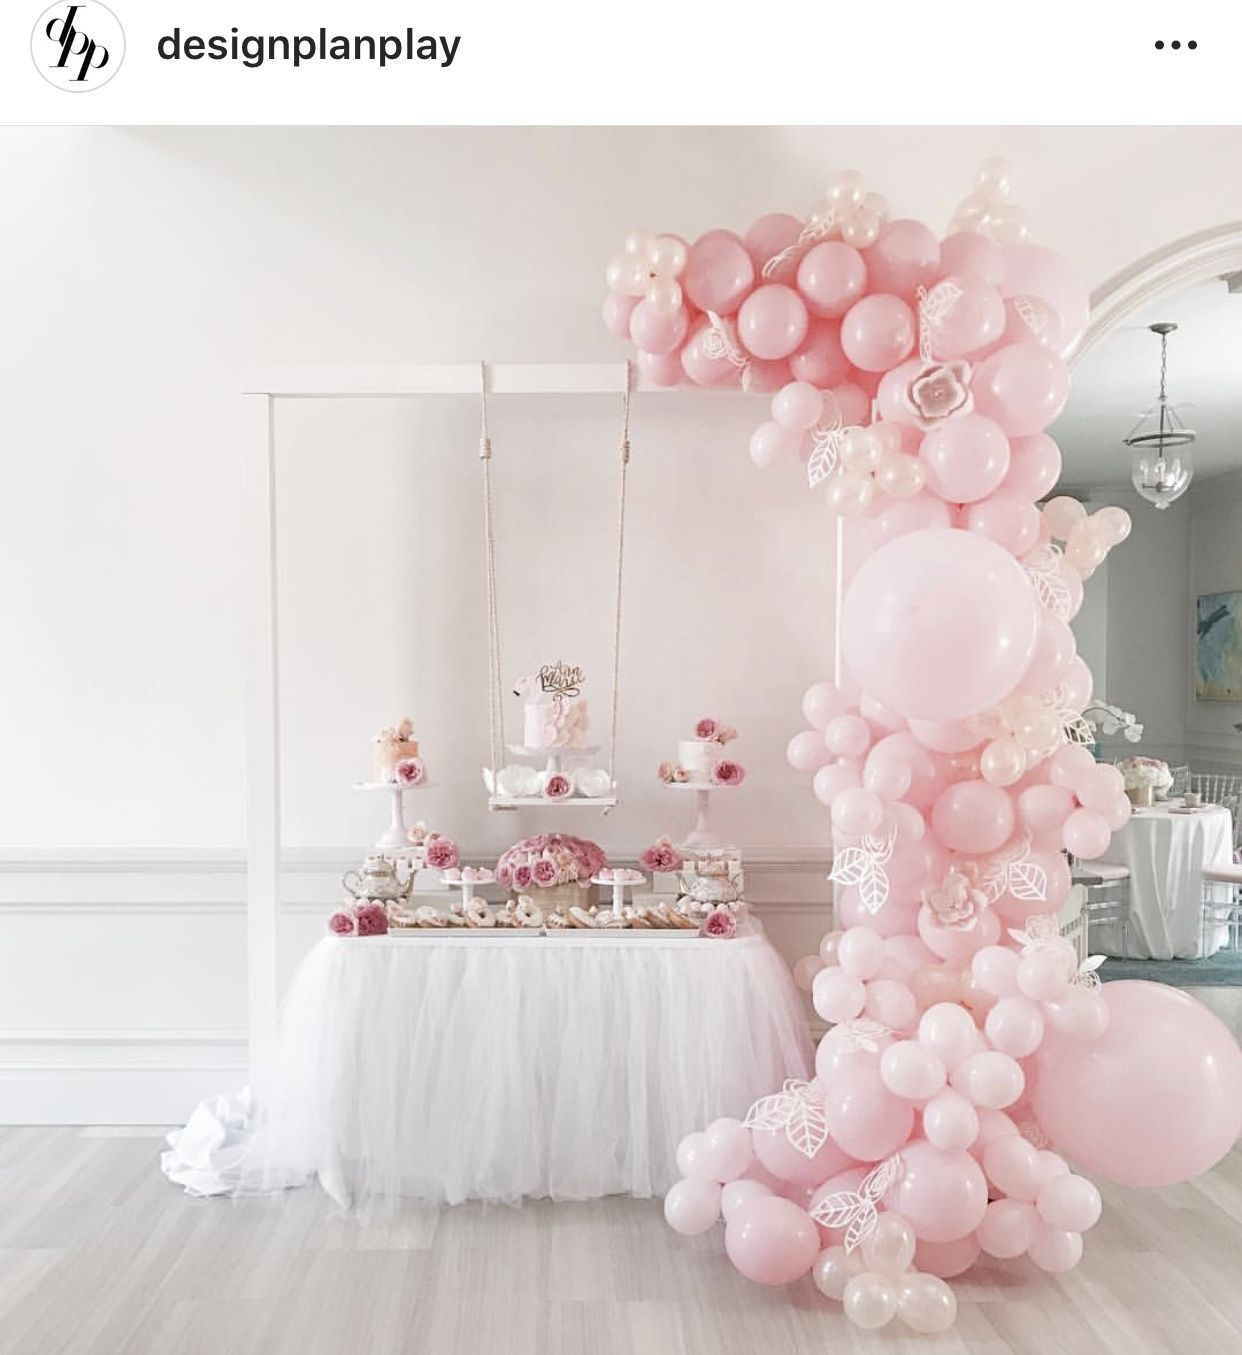 Pin by enidia rivera on Balloon Decor Creative baby